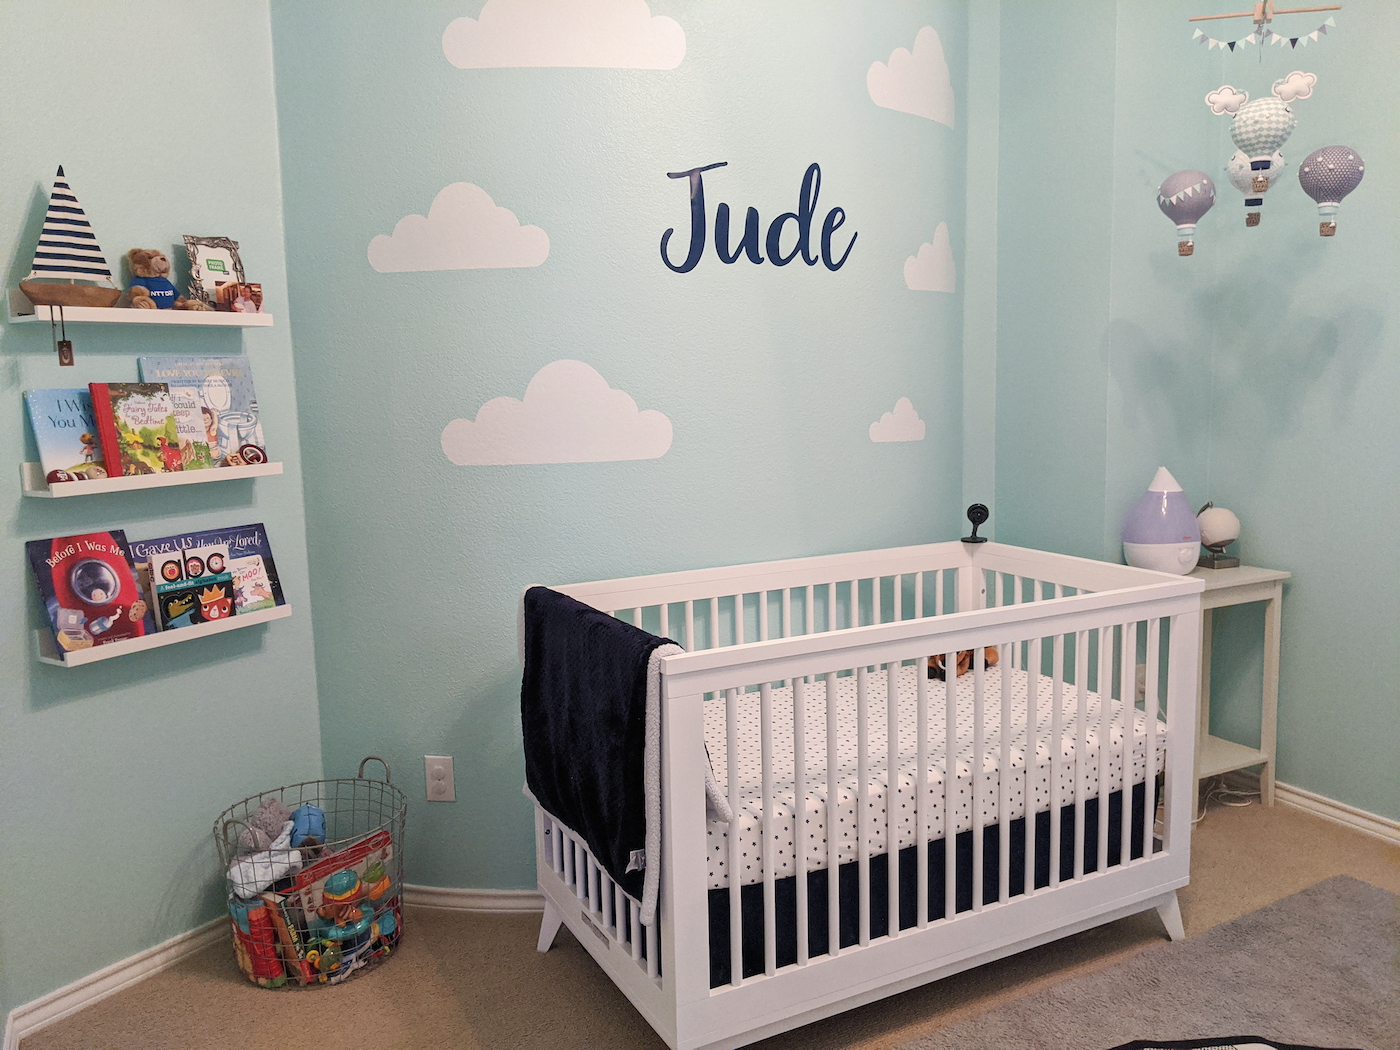 Jude's nursery.